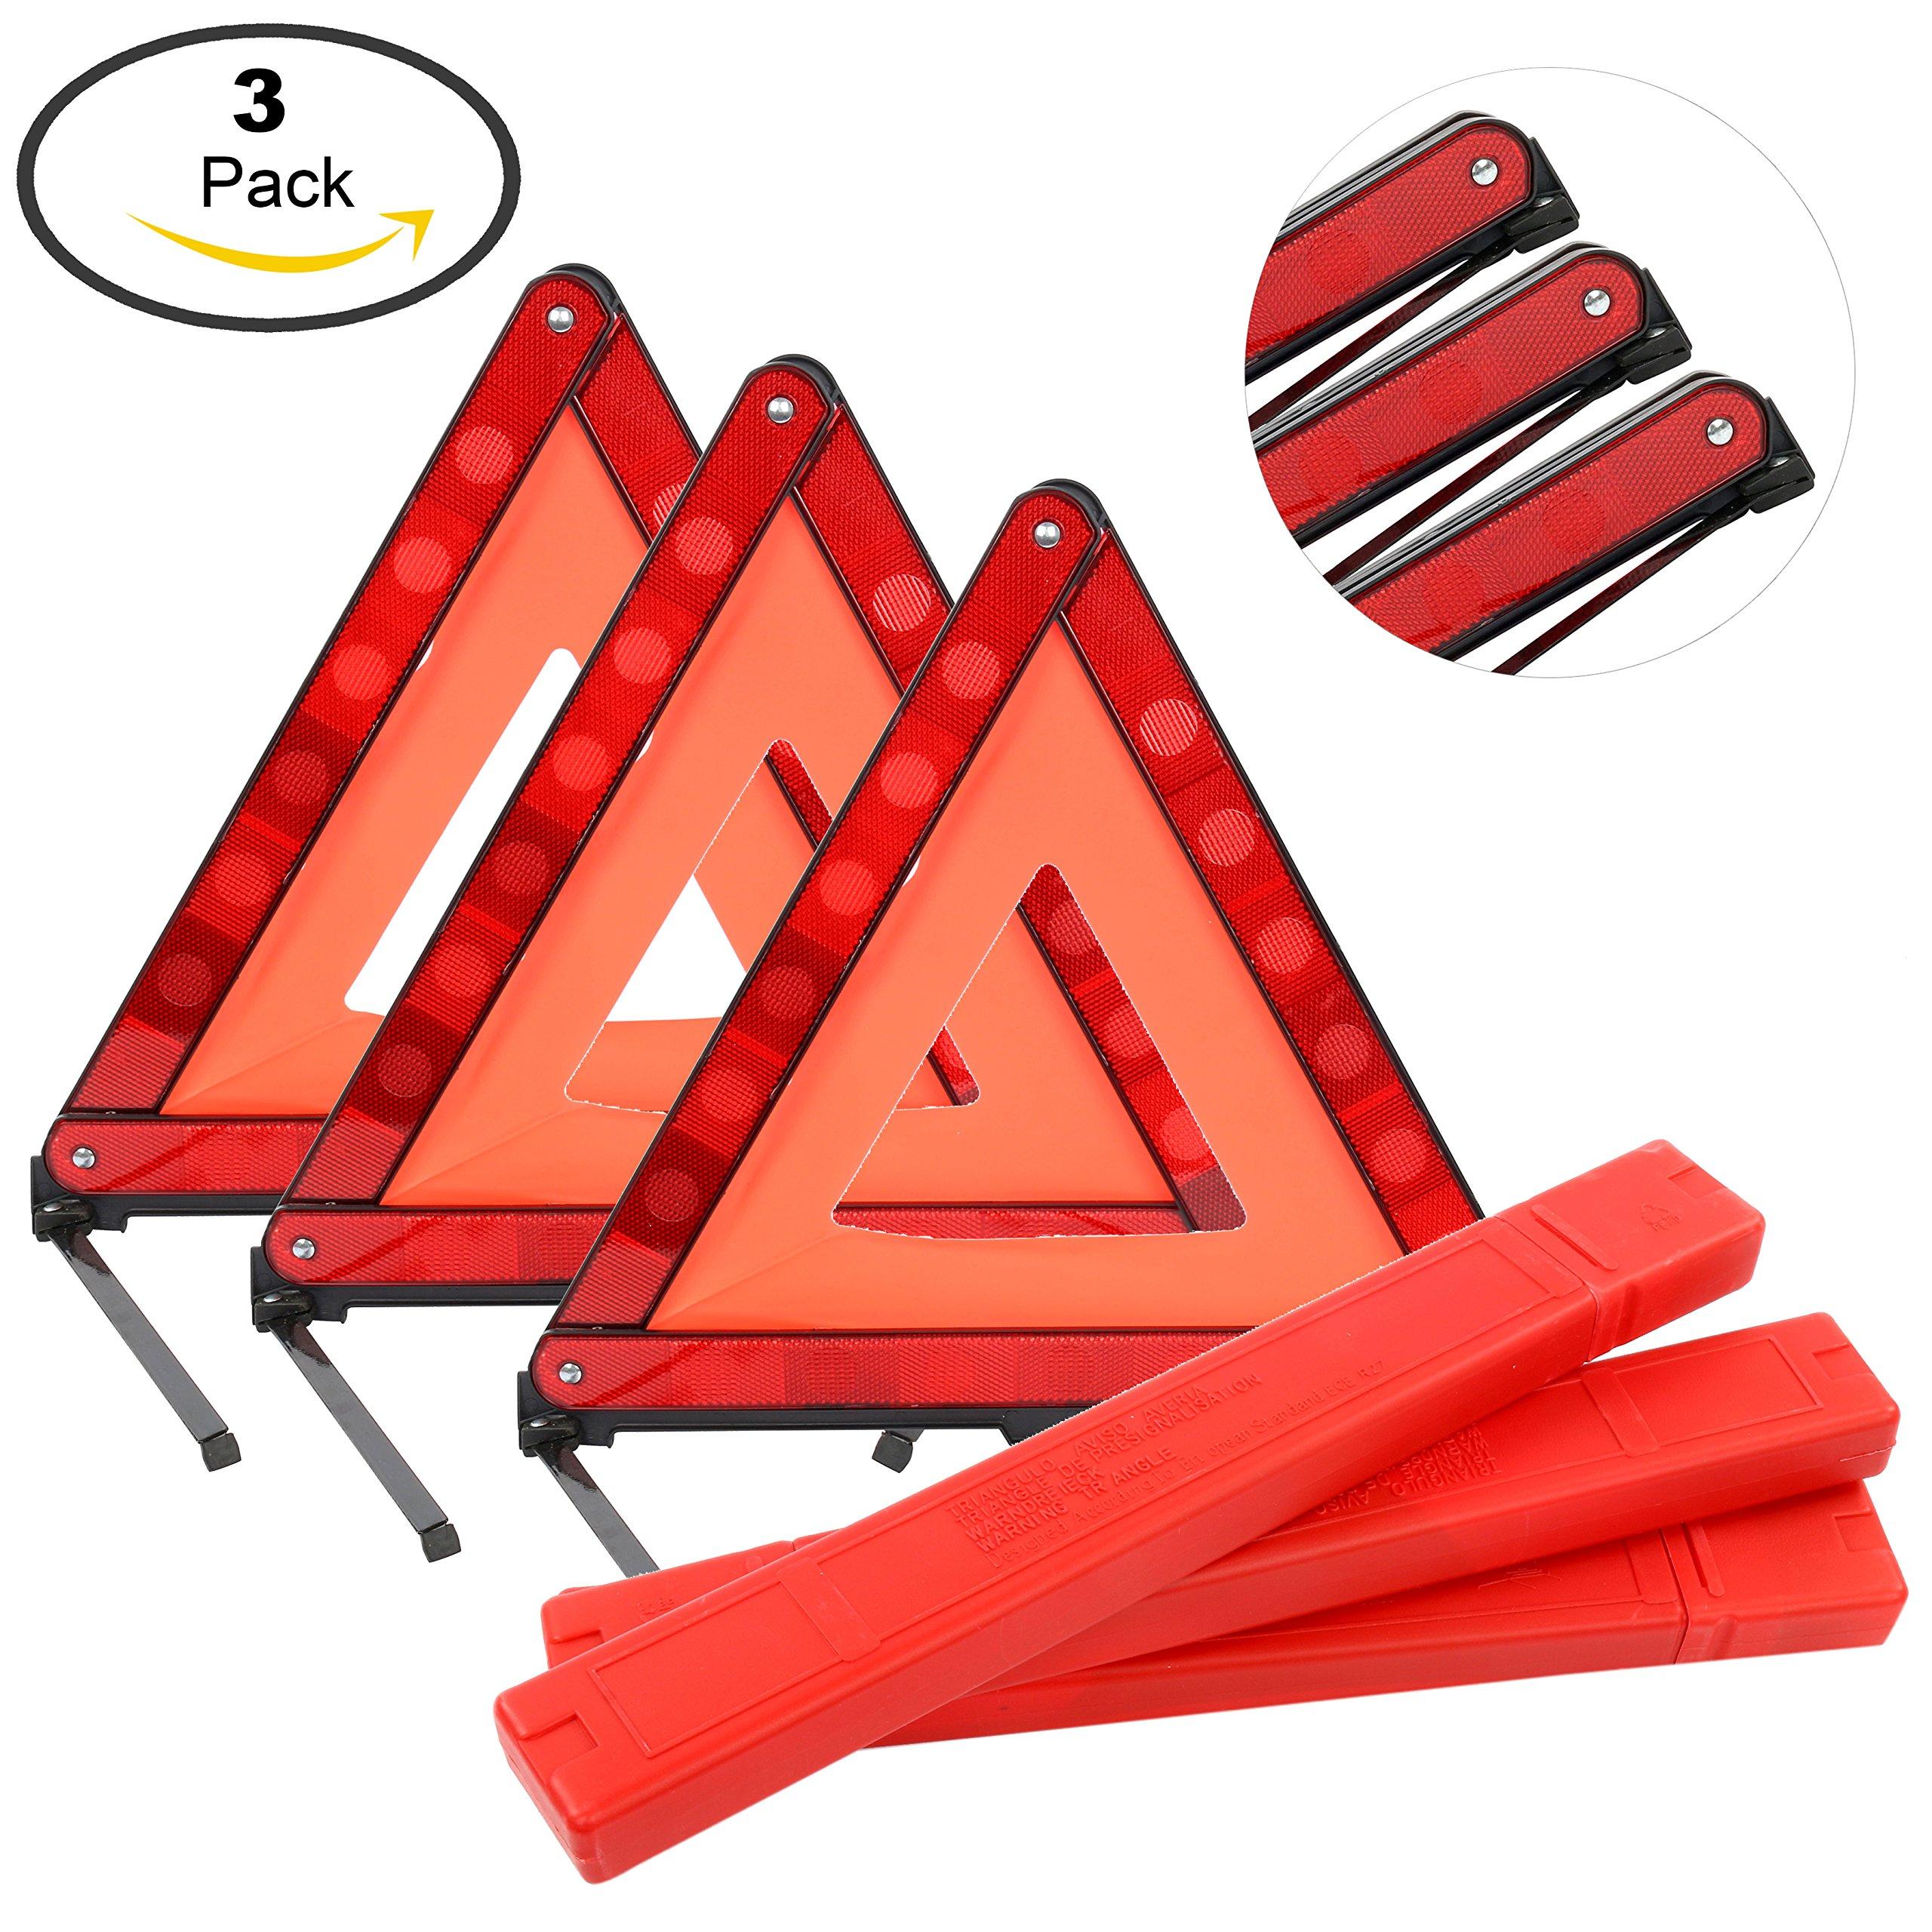 Yaekoo Triple Warning Triangle Emergency Warning Triangle Reflector Safety Triangle Kit, Foldable Reflective Roadside Safety Warning Sign, 3-Pack